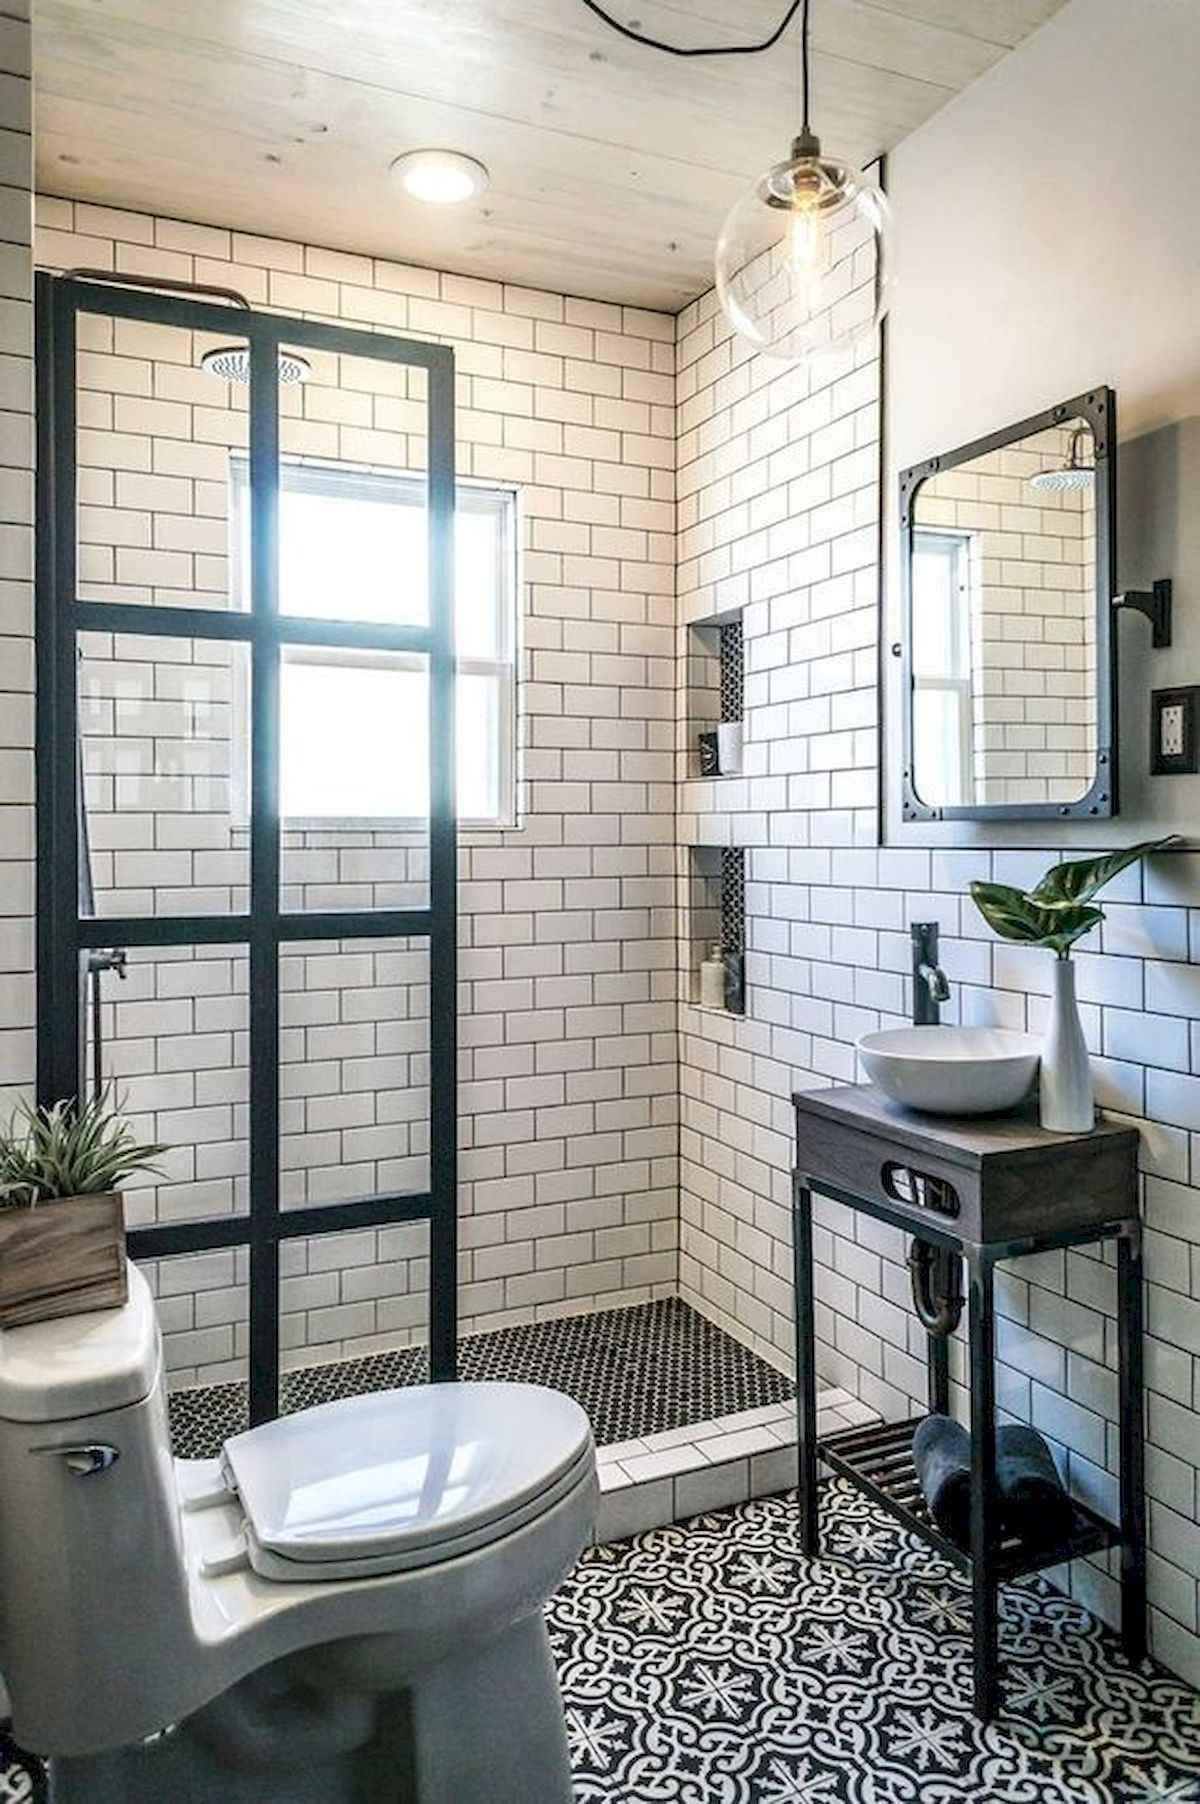 50 stunning small bathroom makeover ideas 30 full on stunning small bathroom design ideas id=66140